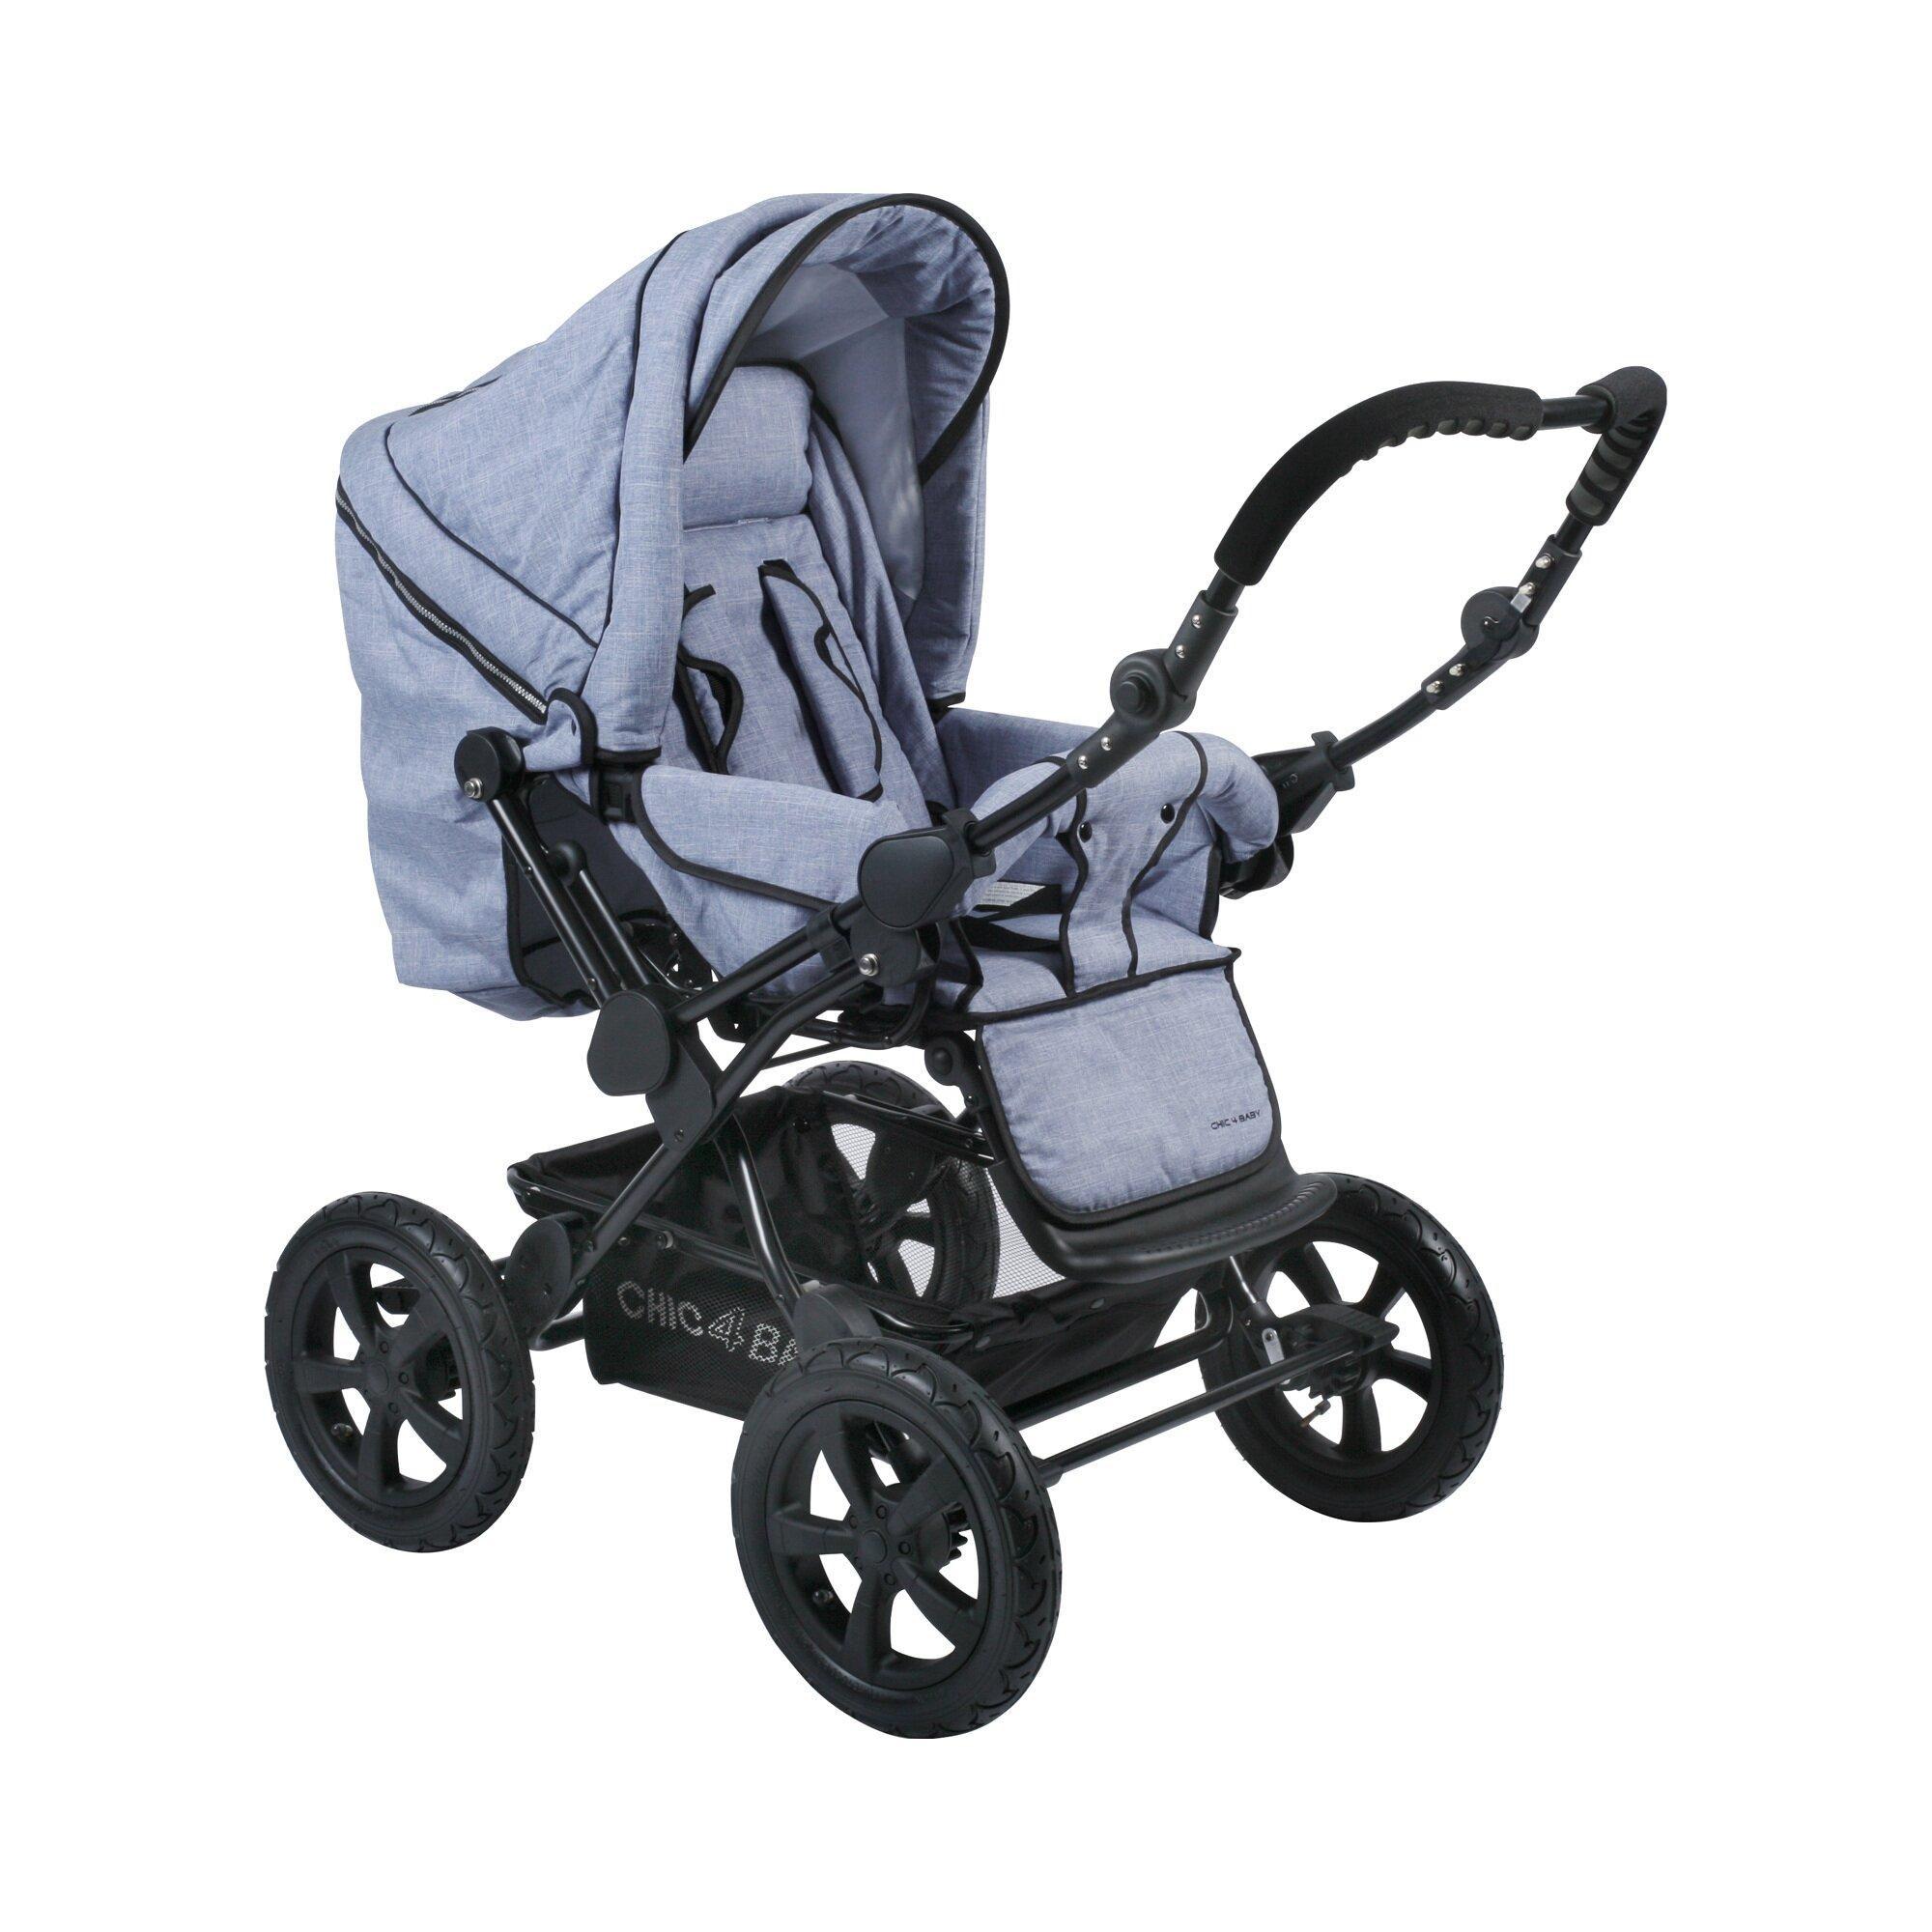 chic-4-baby-viva-kombikinderwagen-design-2018-blau